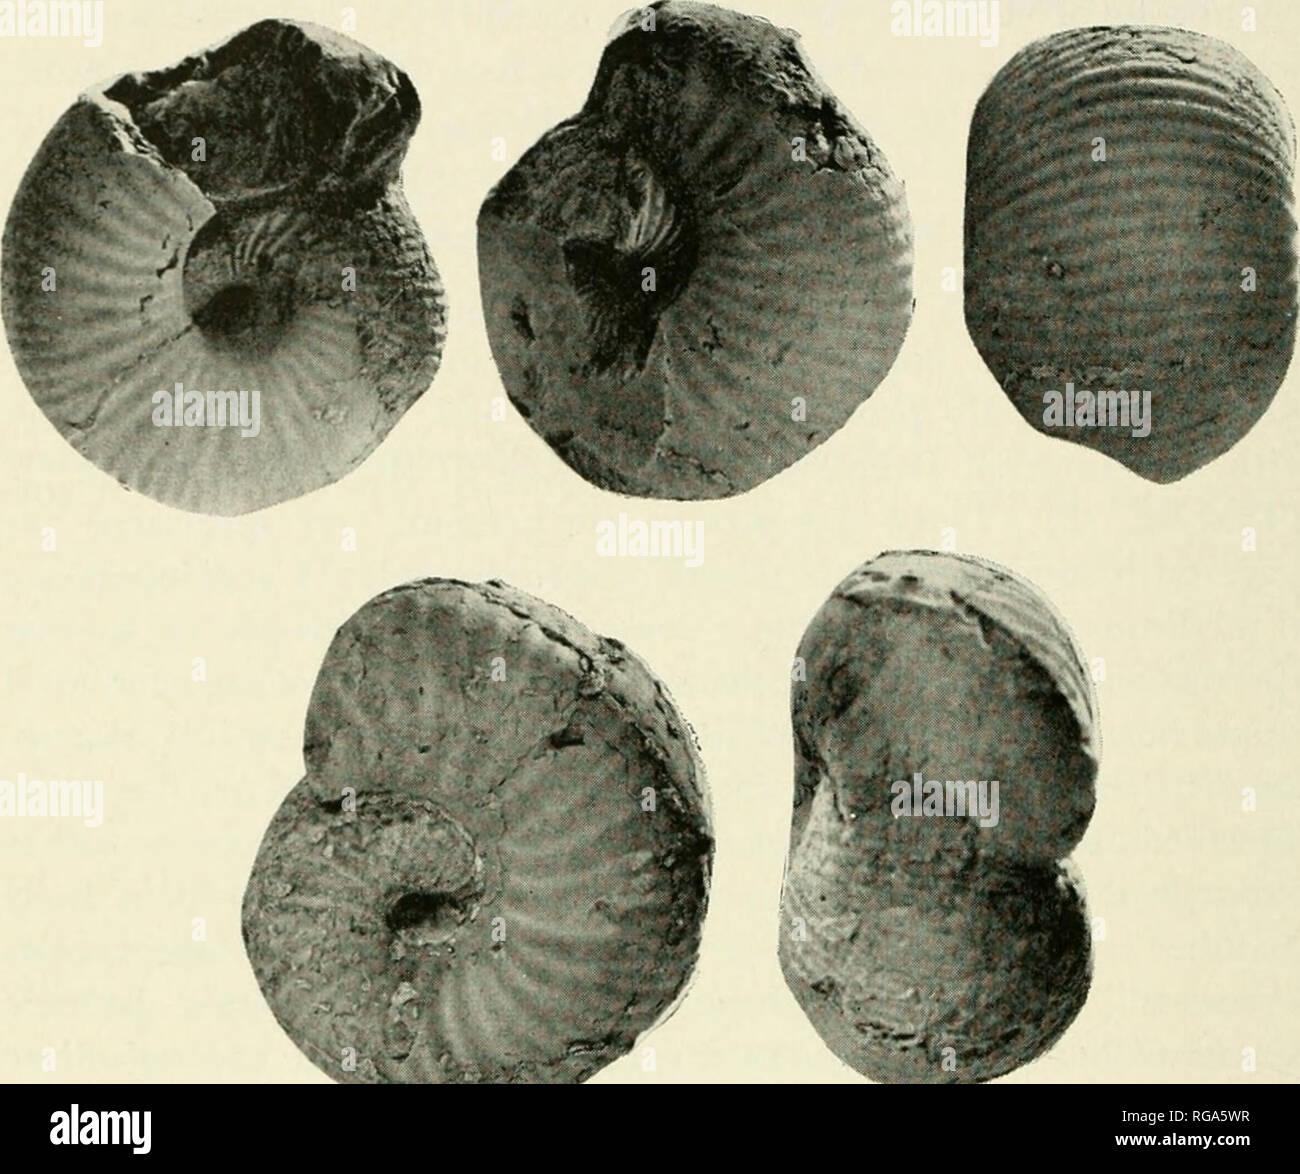 ". Bulletins of American paleontology. 254 Bulletin 256. Text-figs. 10-11. — Comparison (above) ""Sphanoccras cf. hullatum d'Orb."" (Gerth, 1927, p. 226) [= Bullatimorphitcs (Treptoccras) aff. B. uhligi (Popovici-Hatzeg) from supposed Calloian of the Wairori River (loc. 1), with (below) a topotype of B. (T.) ""sucvicum (J. Roemer)"" [ = B. uhligi' from the O. aspidoidis Zone, Upper Bathonian, of Hildesheim, Germany (Nie- dersachs. Landsamt Bcdenforschung). xl. Original Coll. B.F. B./N.L. f B han- nover 6537. ?Genus BULLATIMORPHITES Buckman, 1921 Bullatimorphites ?, n. sp. 9 PI - Stock Image"